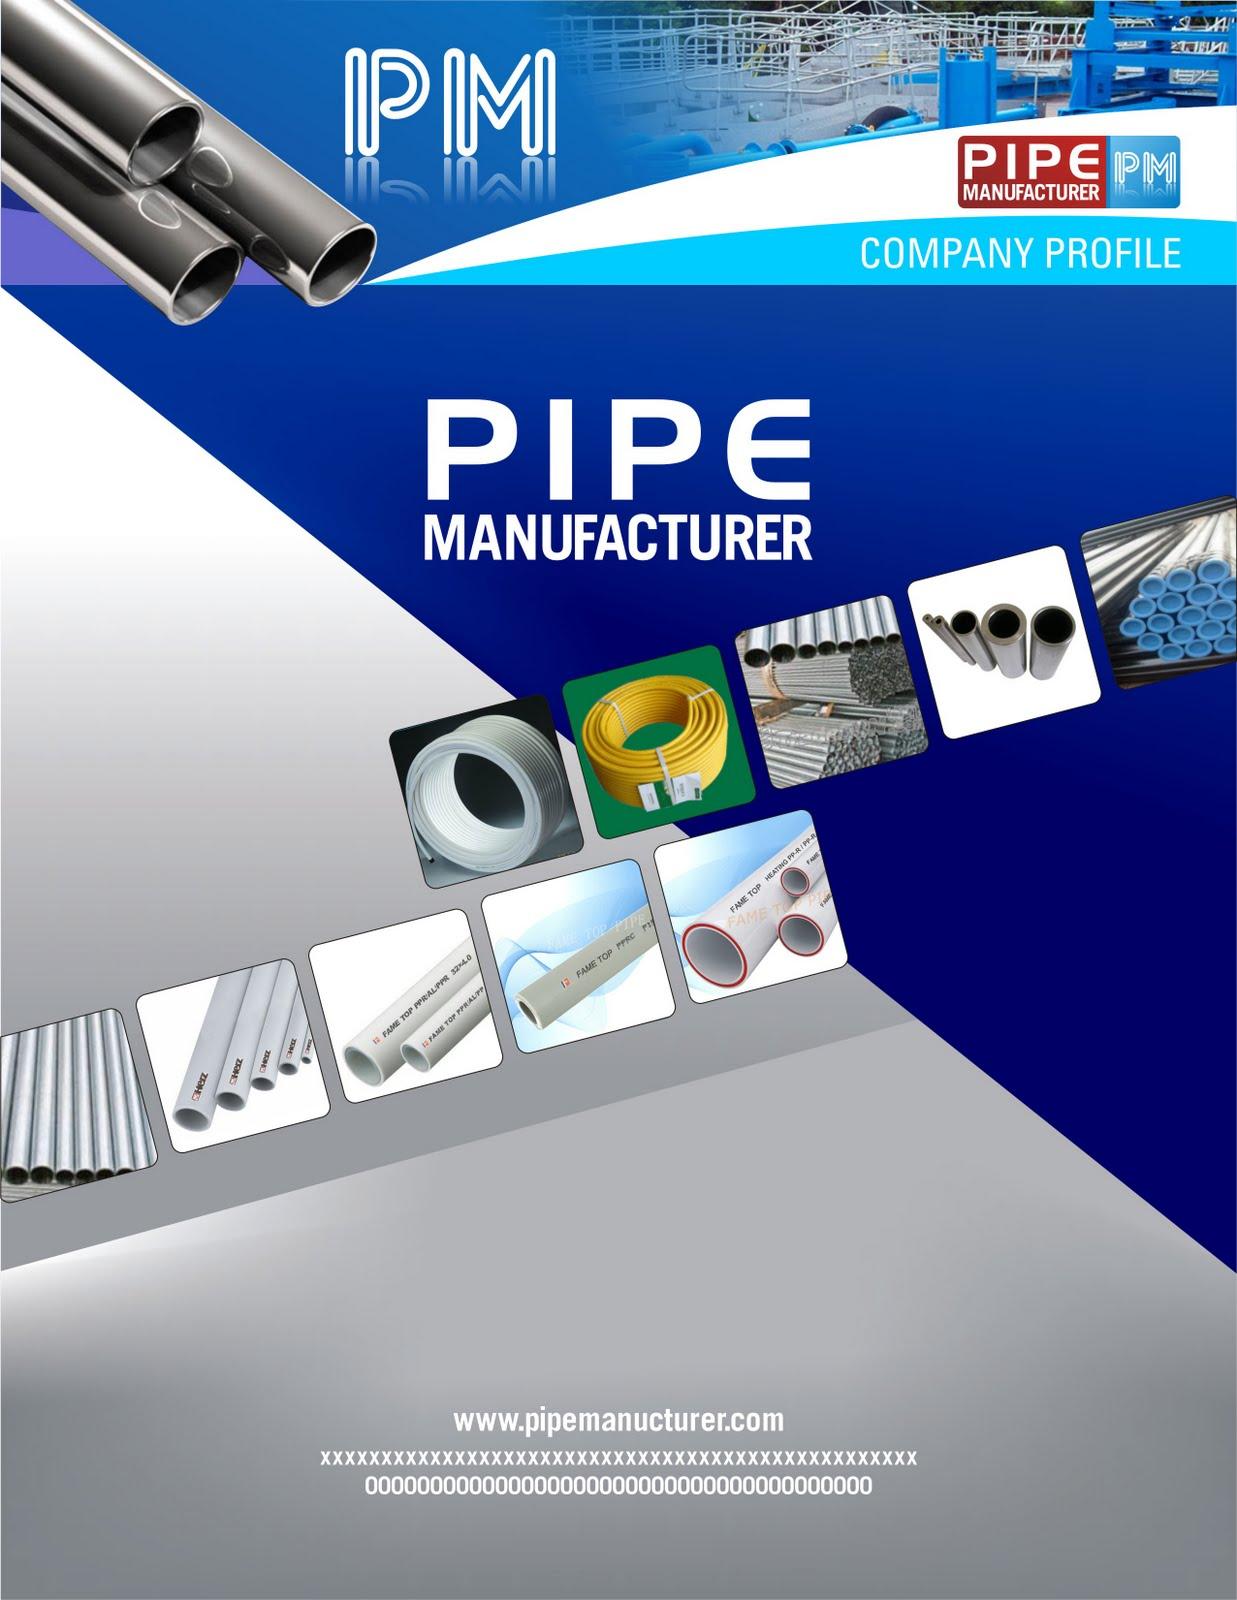 Ammar Enterprises (Pvt.) Ltd.: Company Profile Designs